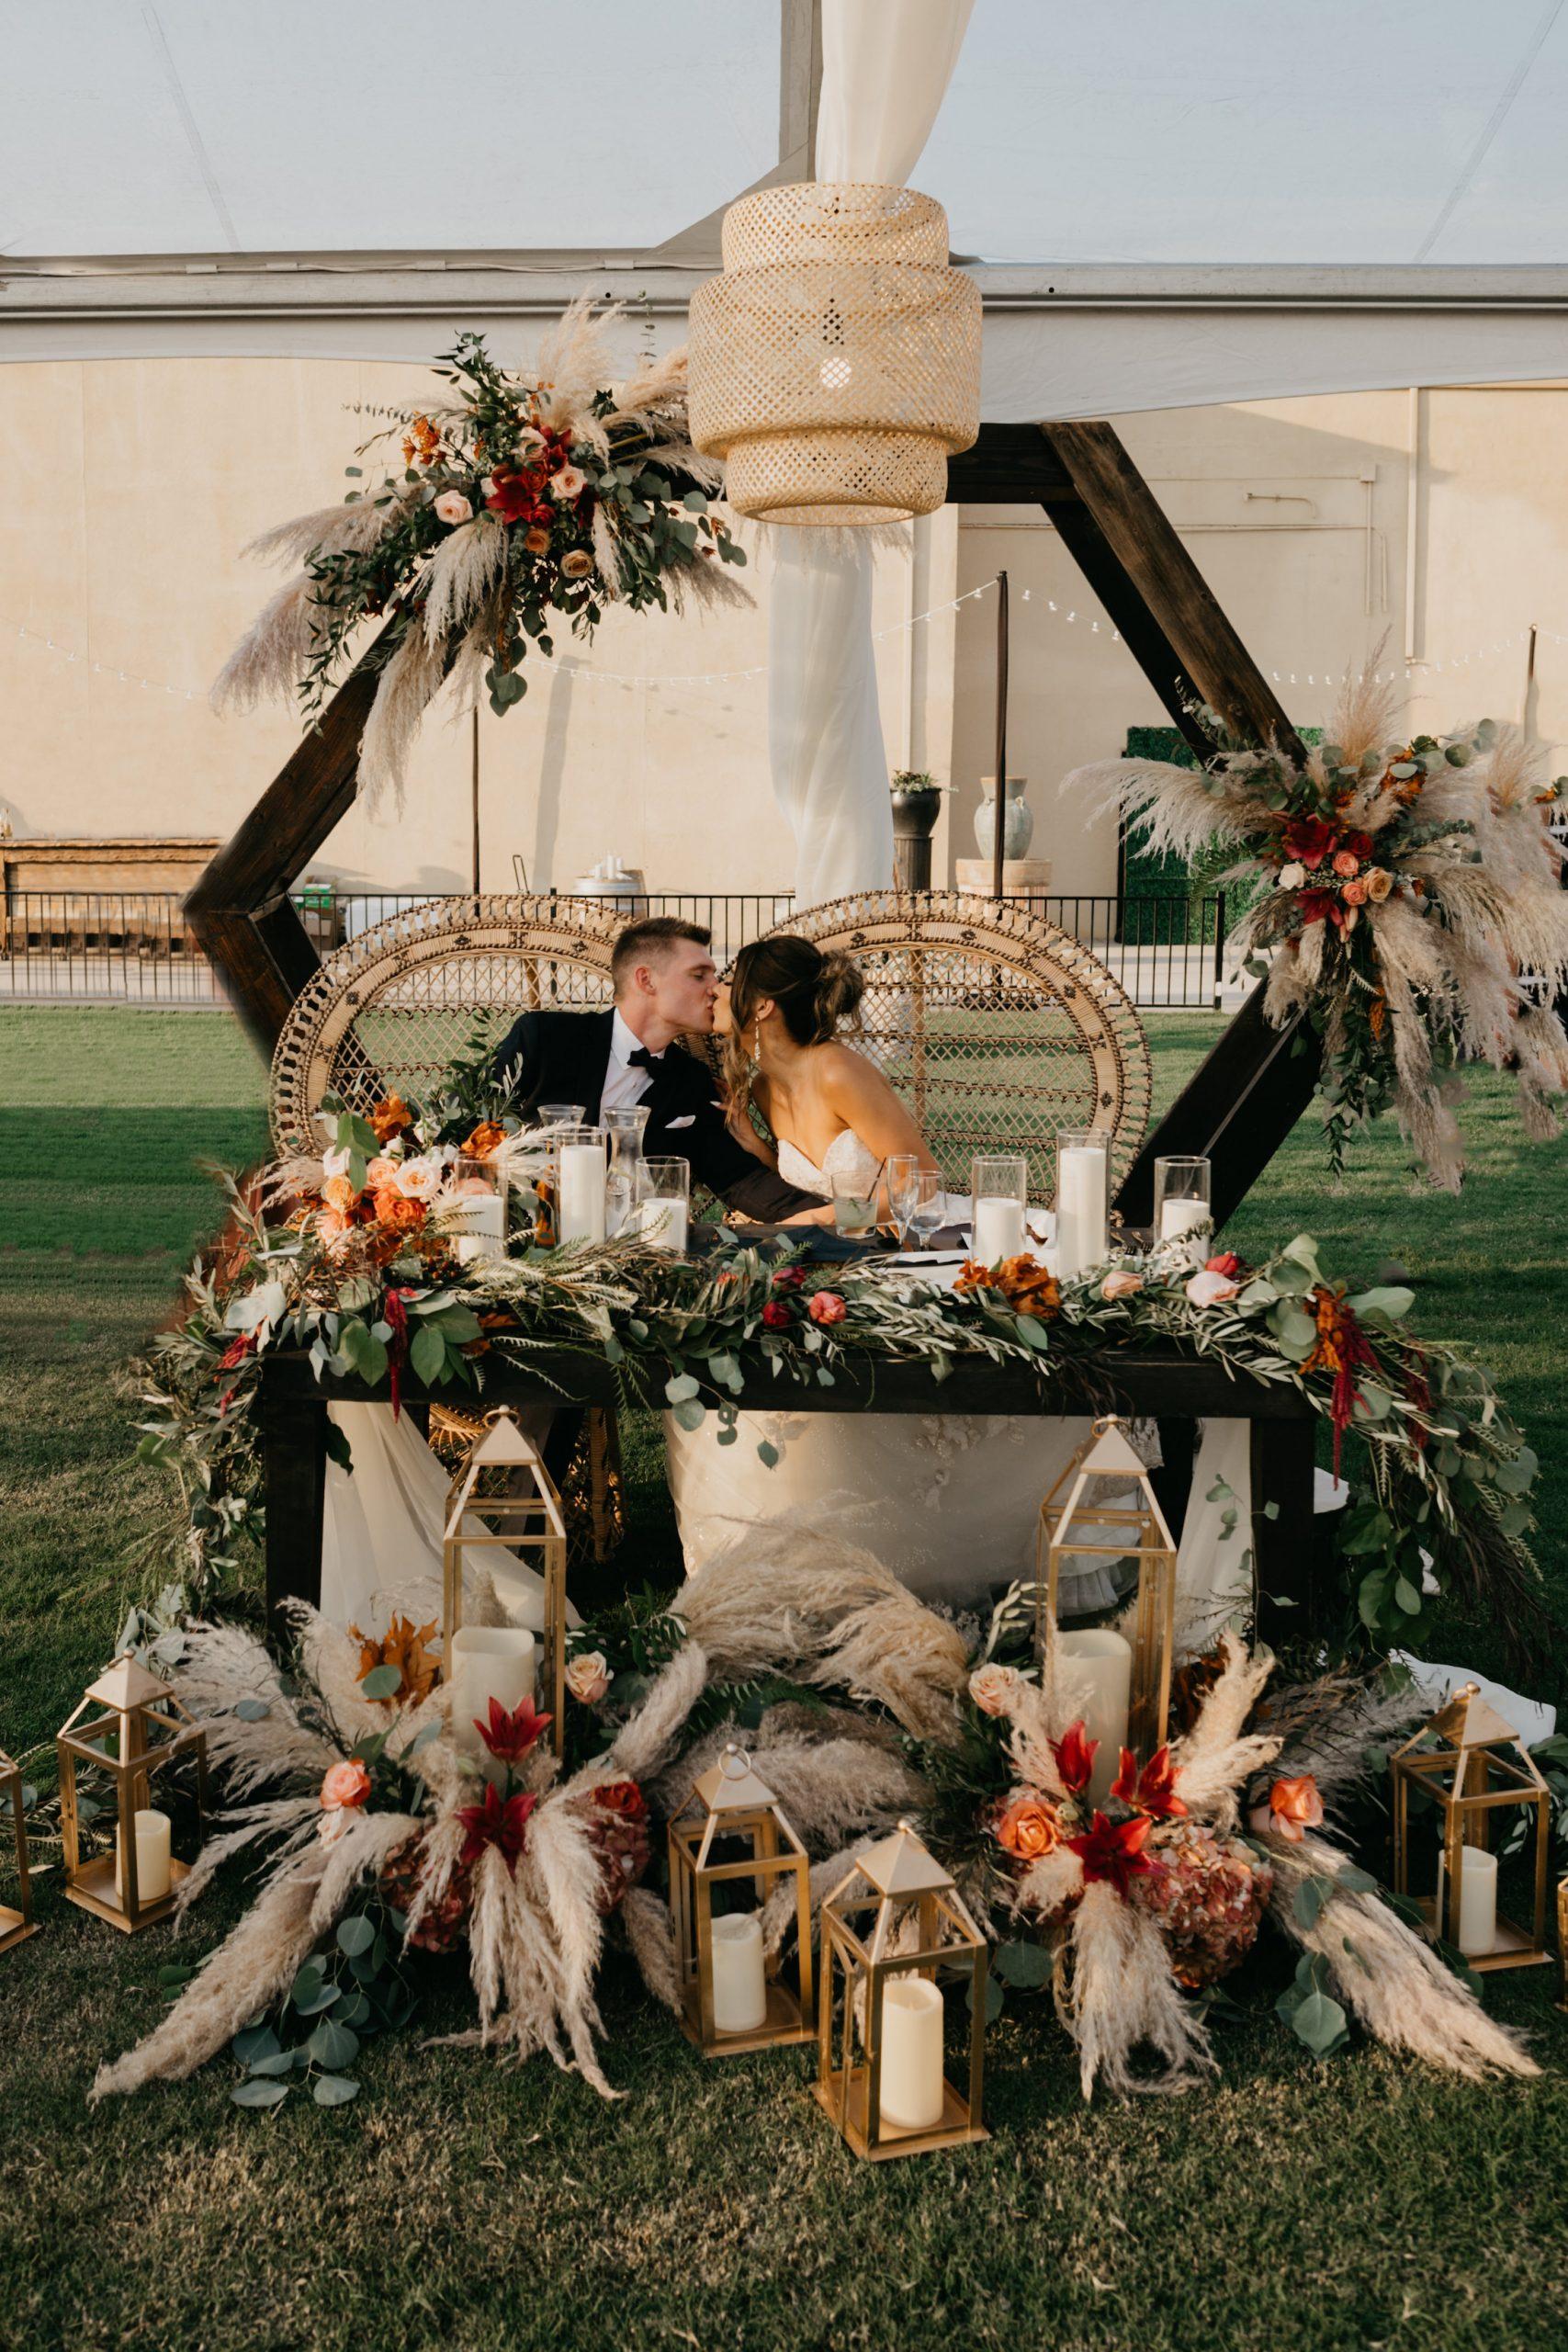 Evanelle Vineyards Wedding Bride and Groom and Sweetheart Table, image by Fatima Elreda Photo